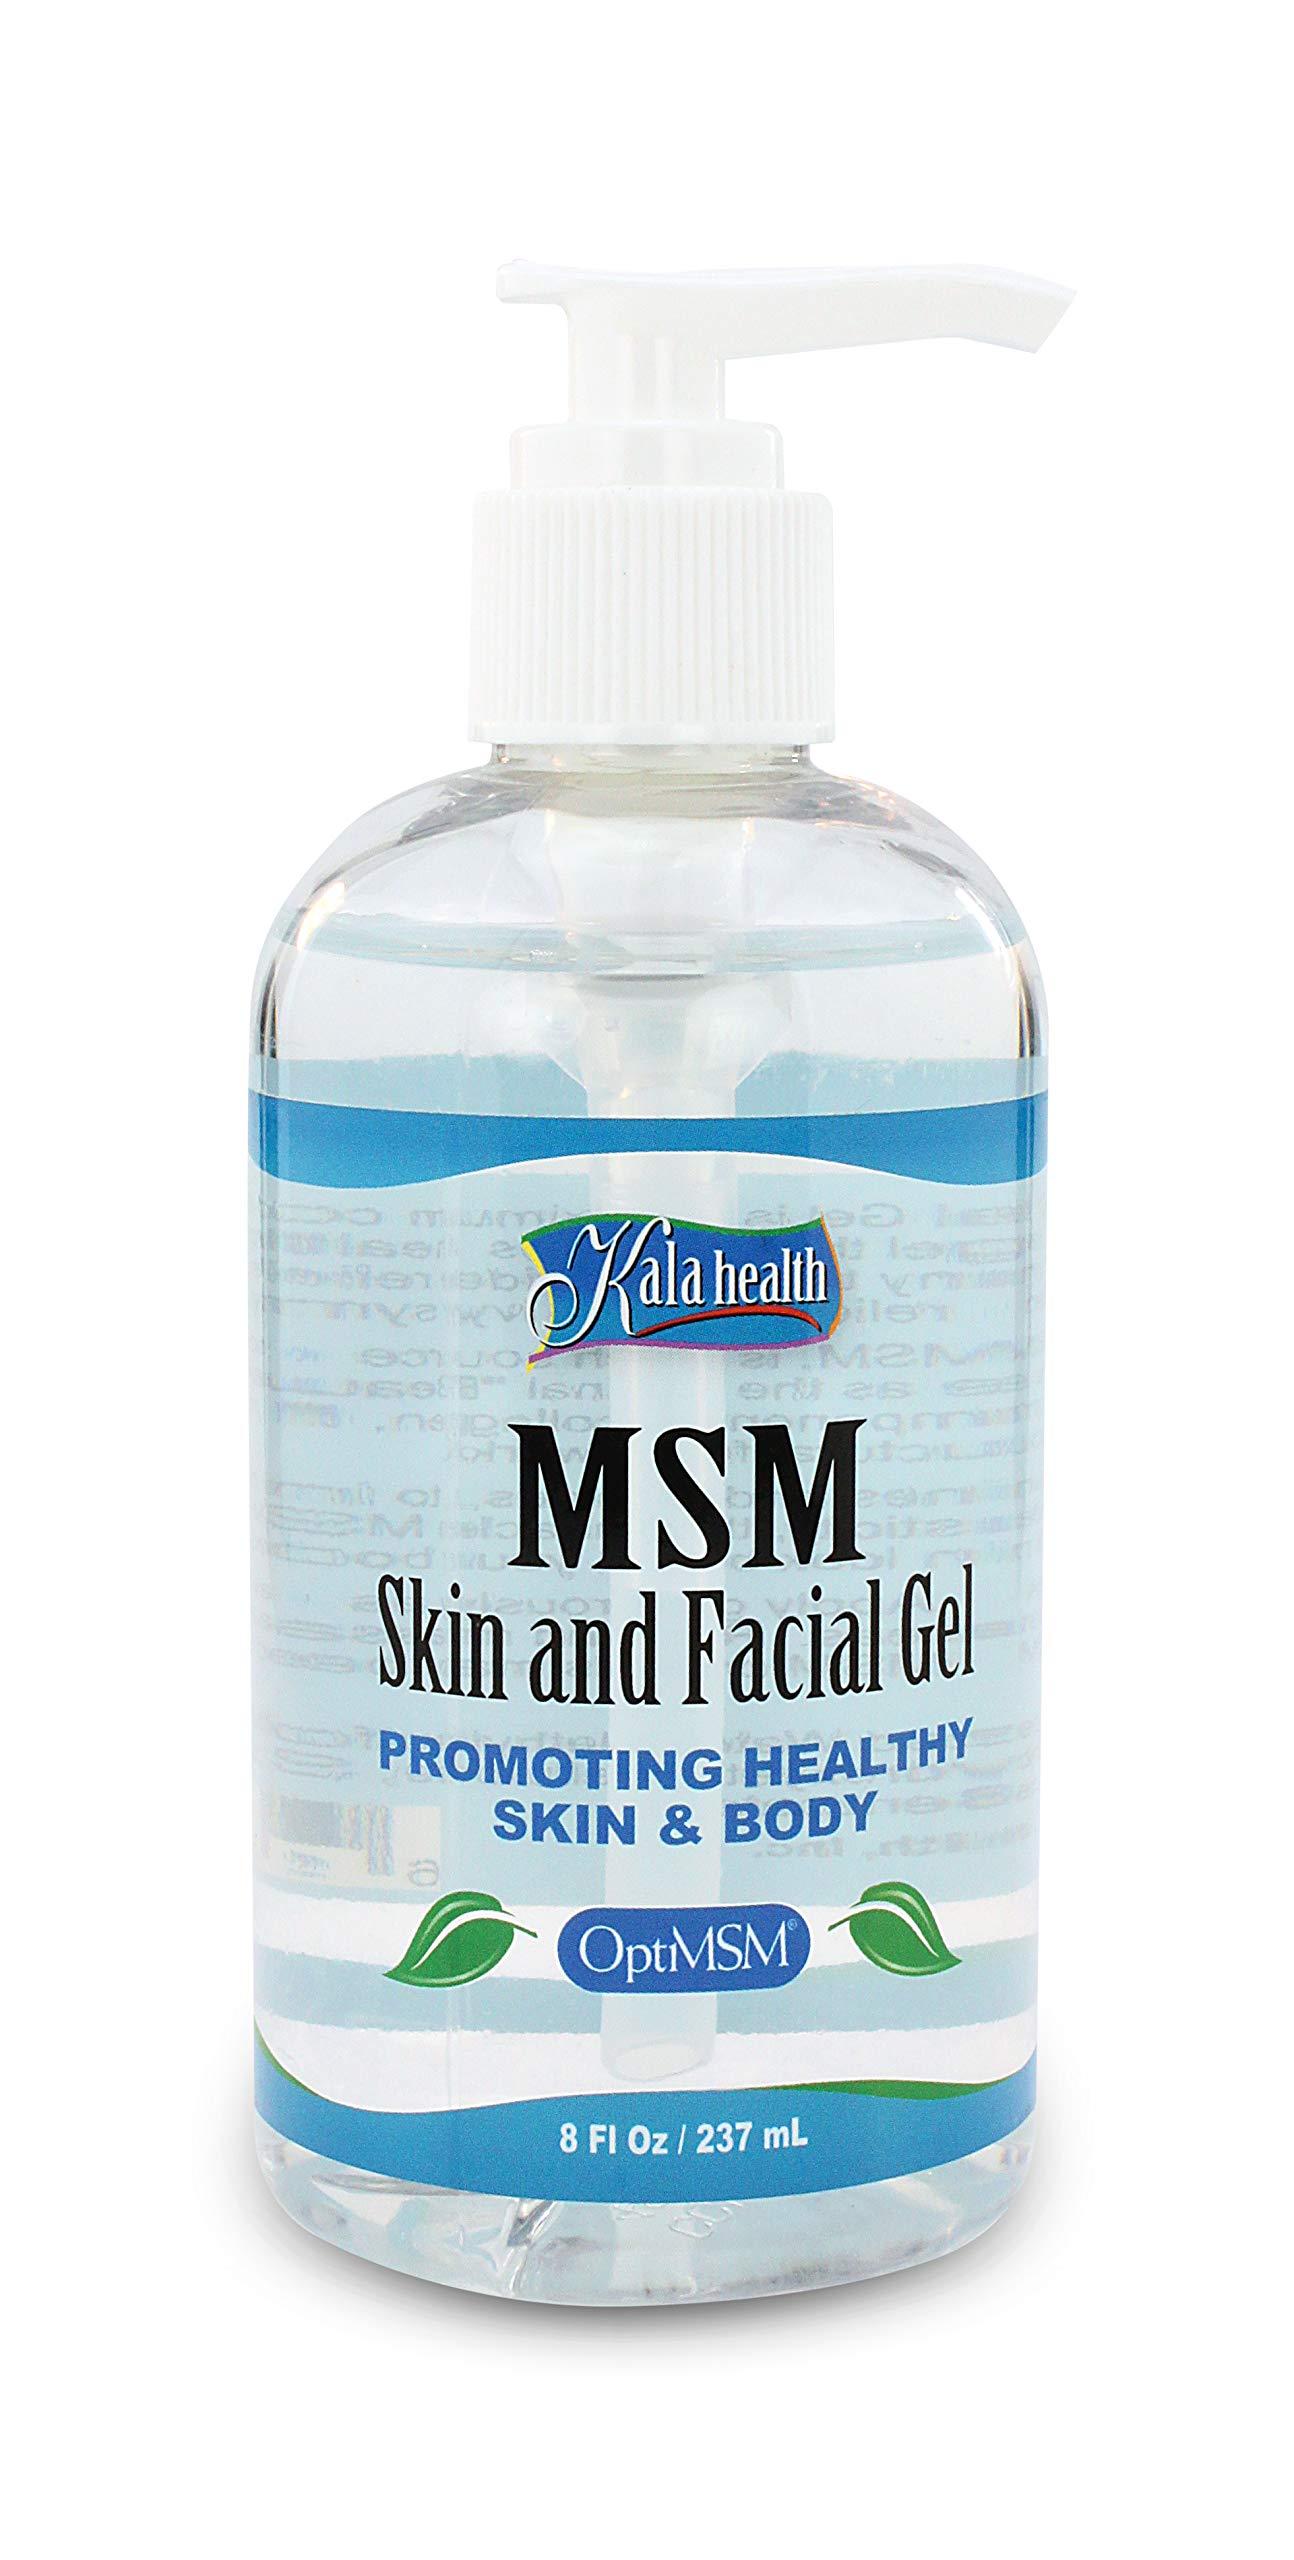 Facial gel with msm